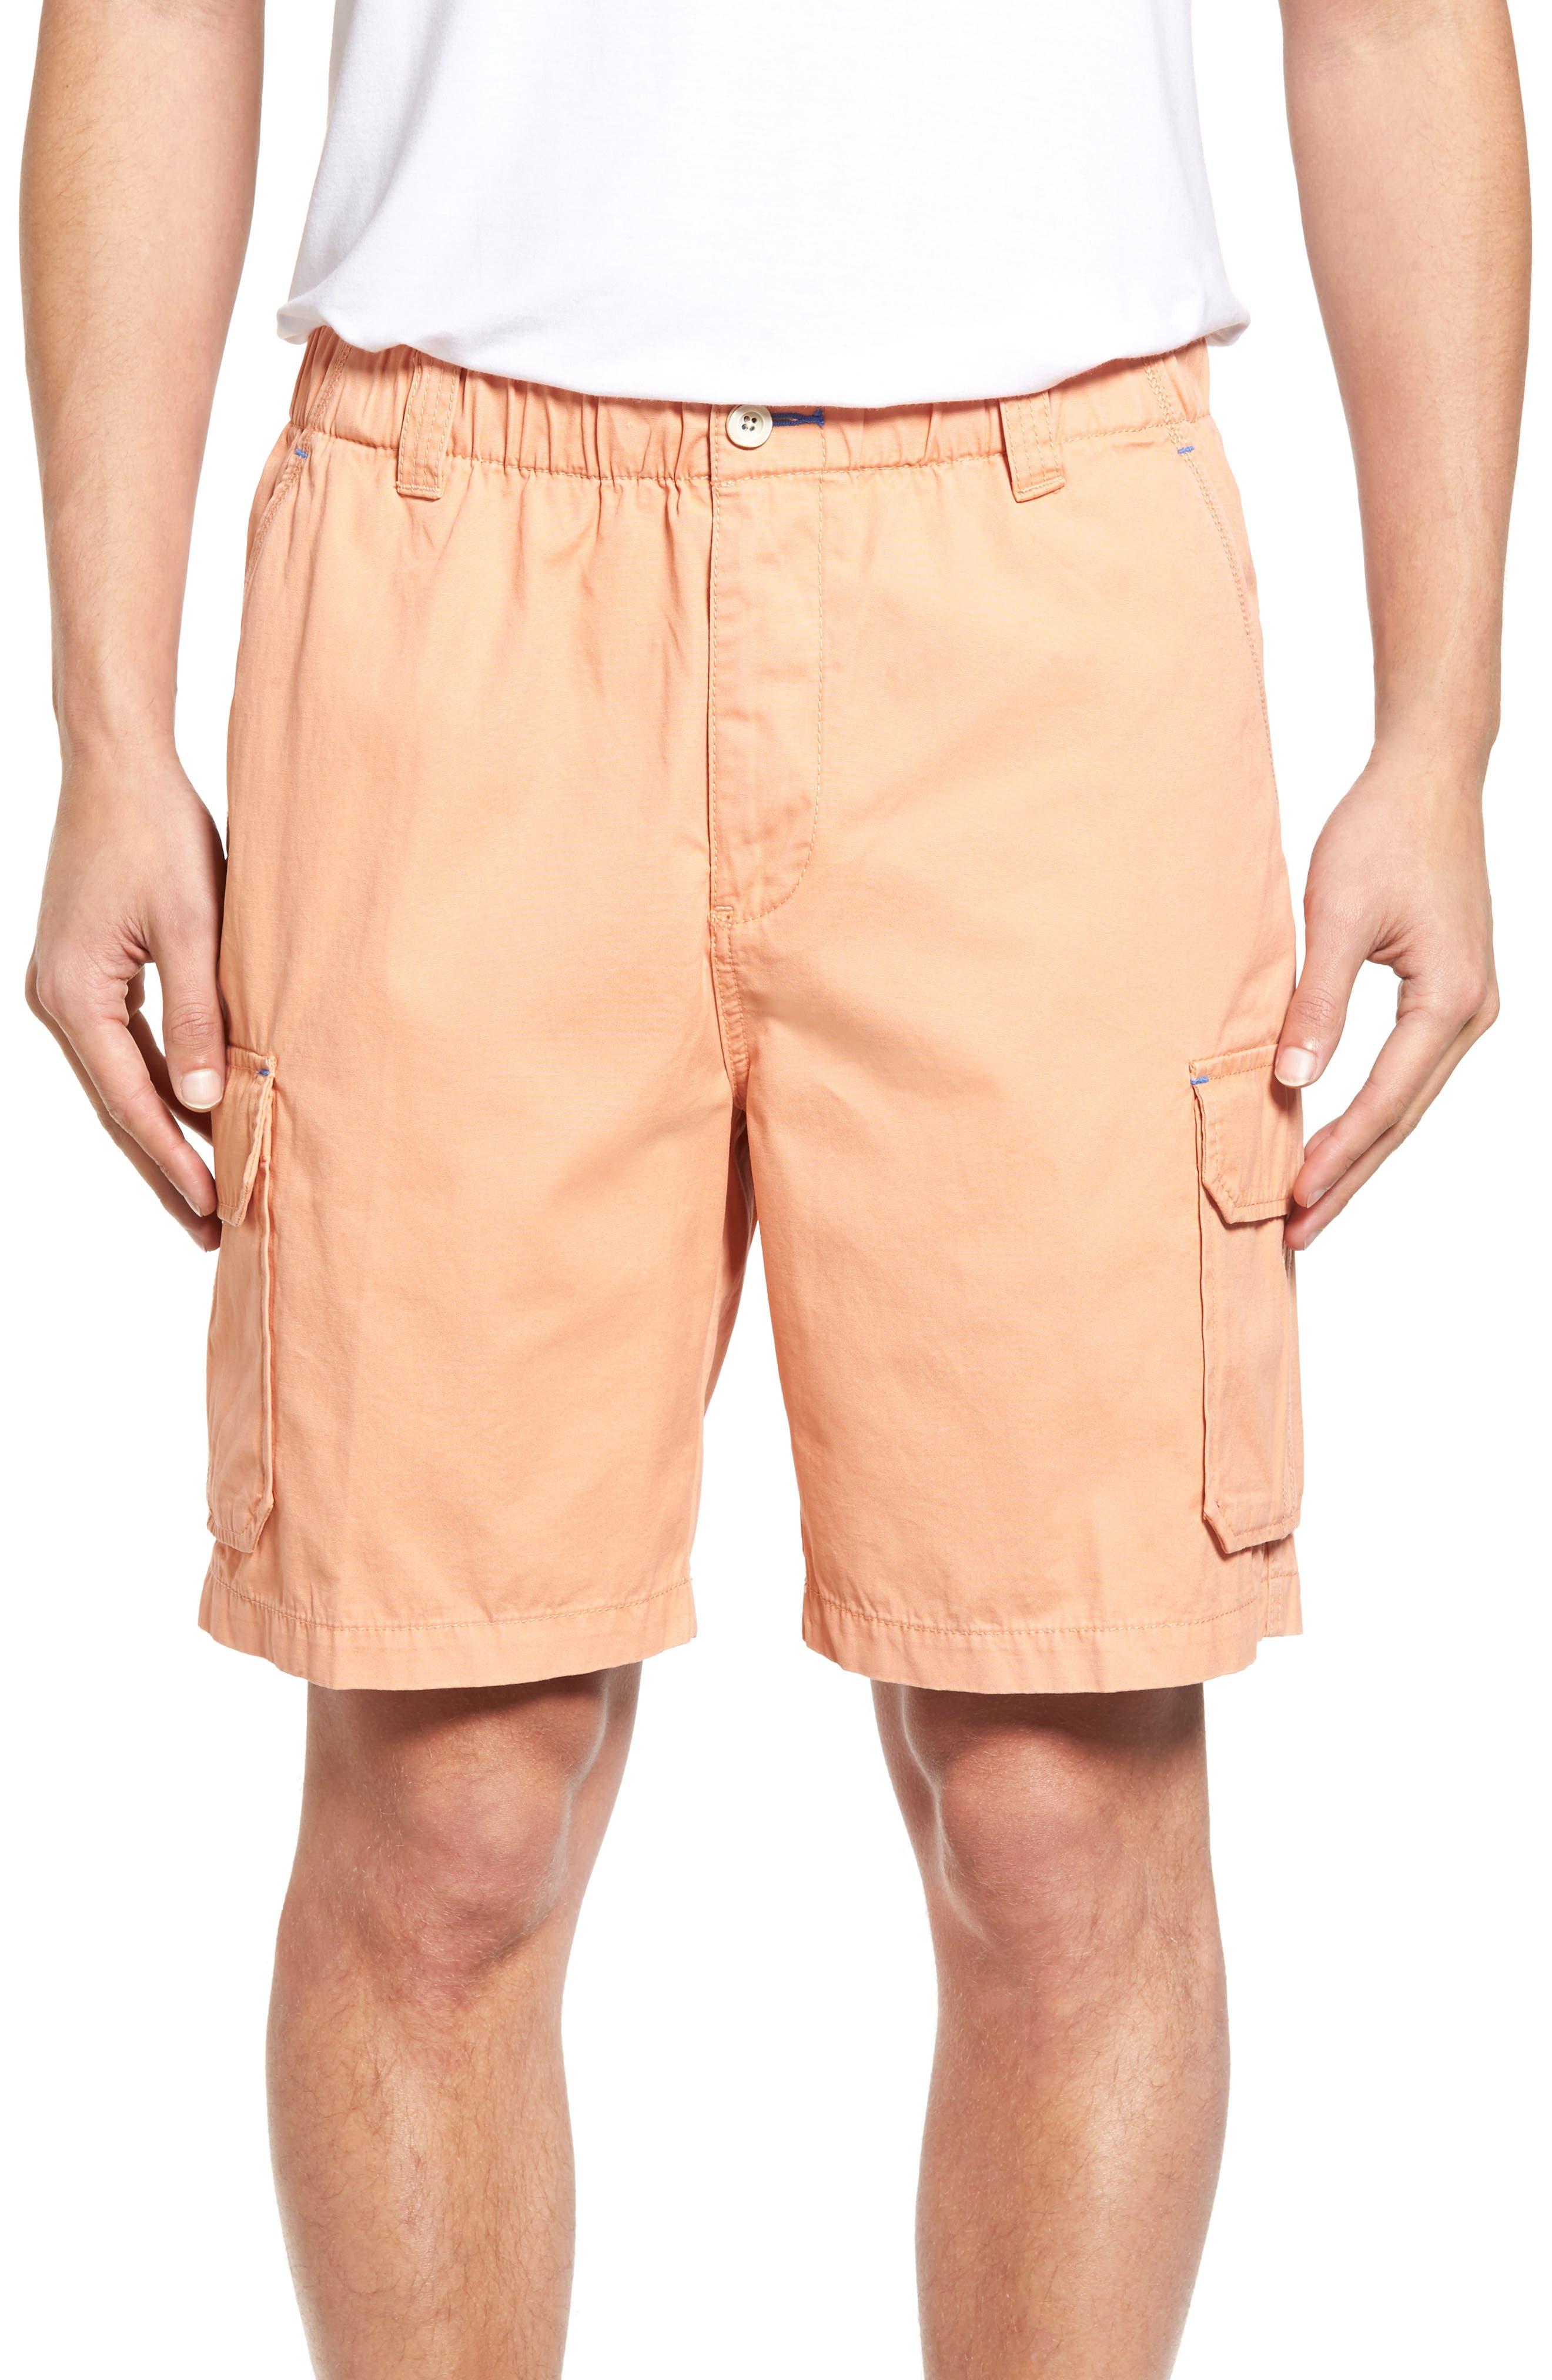 TOMMY BAHAMA 'Survivalist' Cargo Shorts